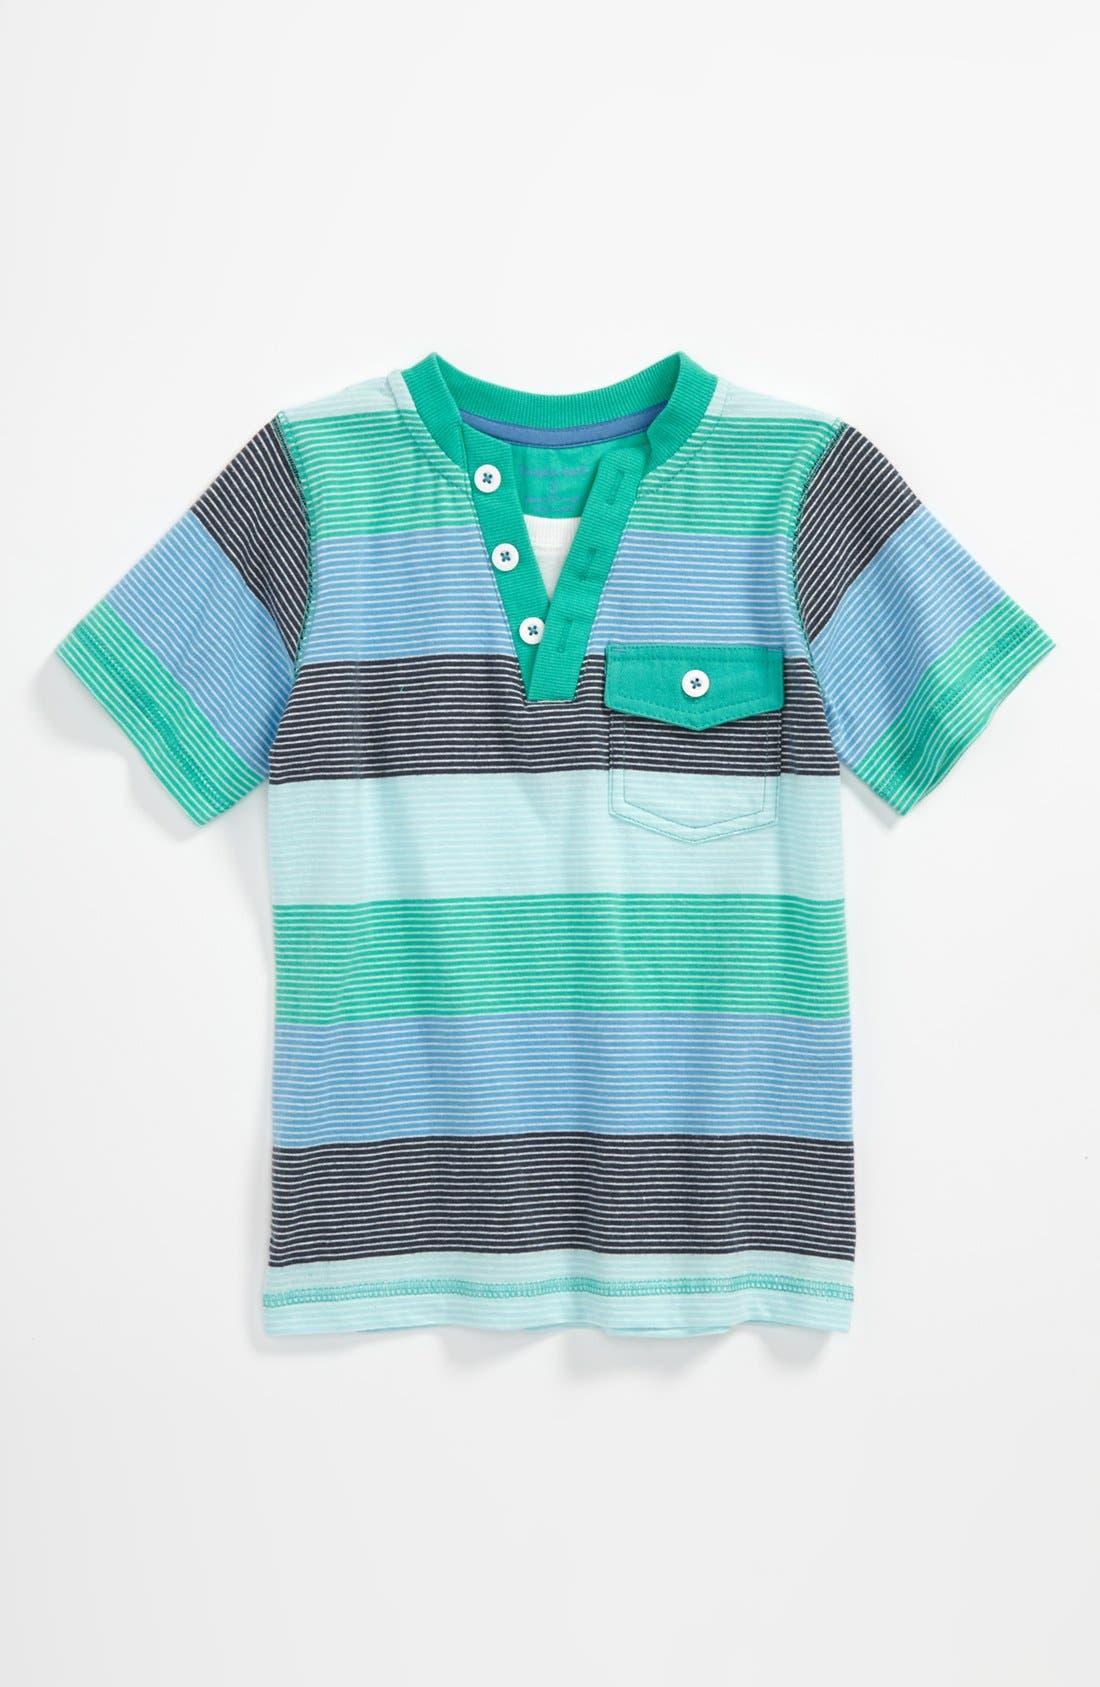 Main Image - Pumpkin Patch Stripe T-Shirt (Toddler)